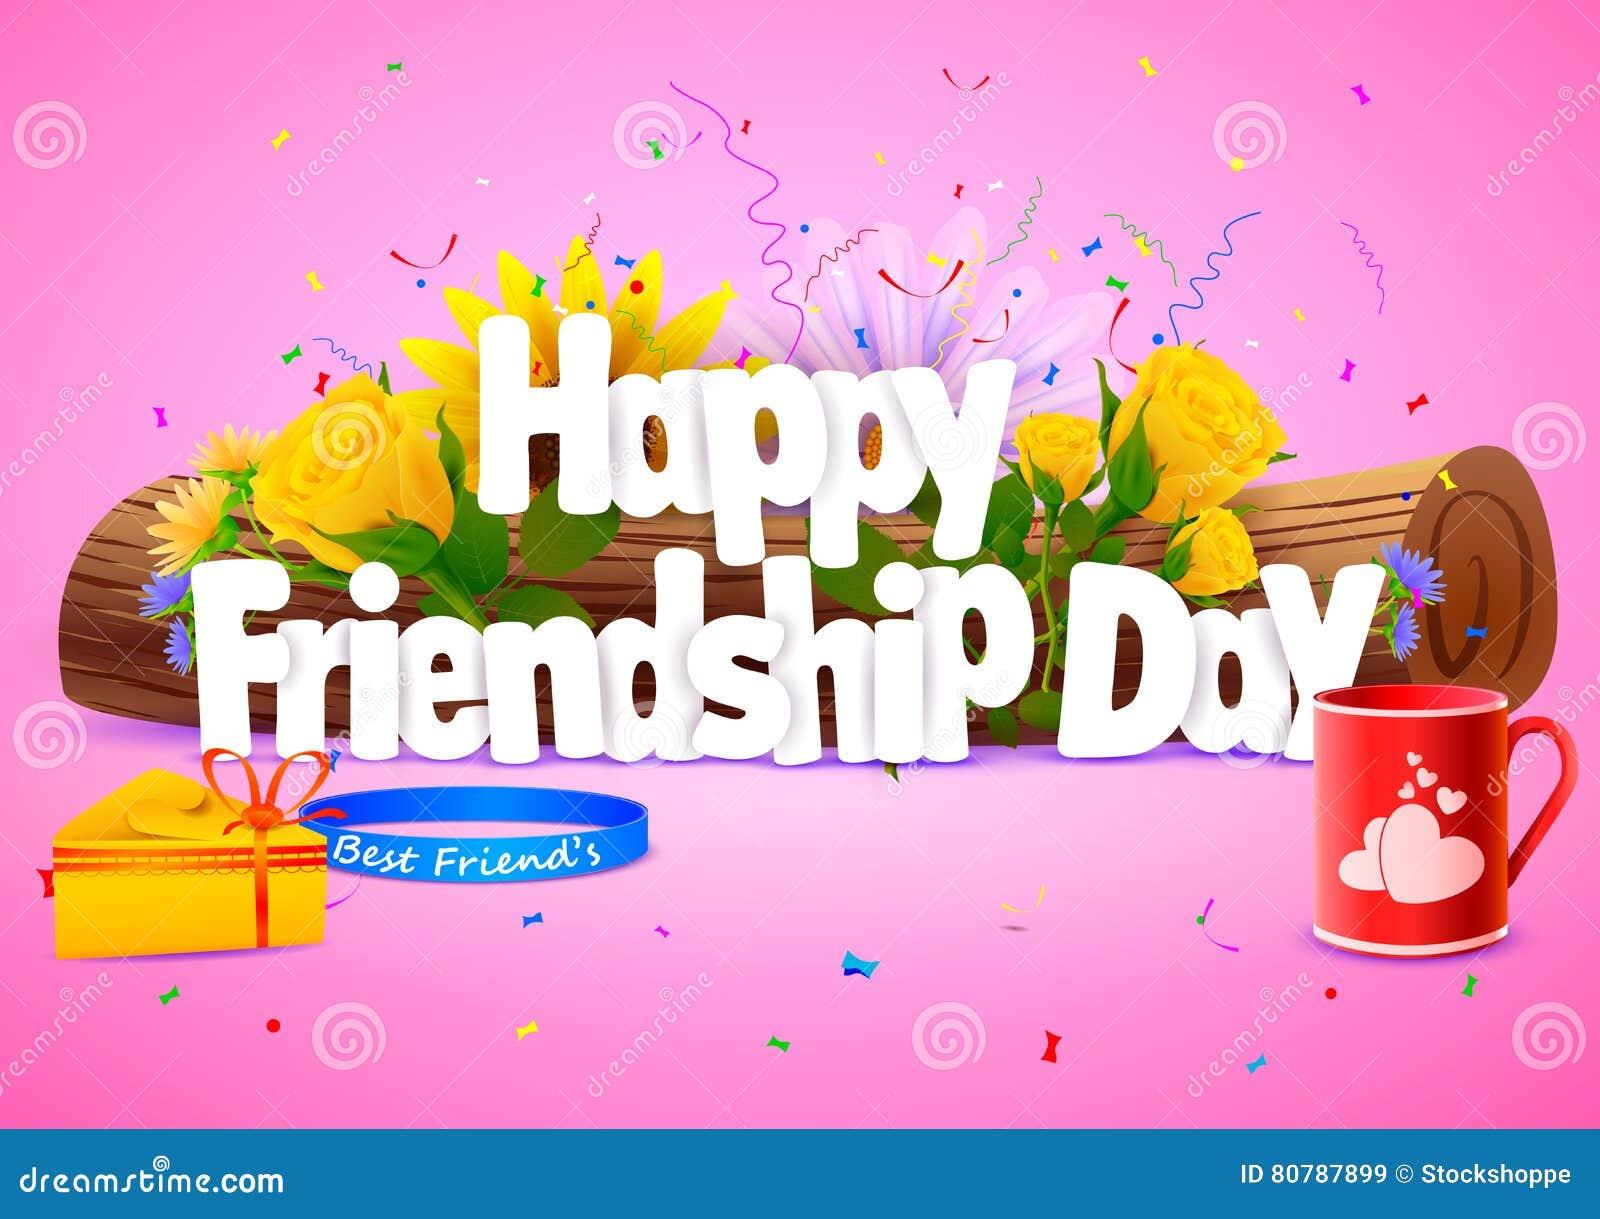 Happy Friendship Day wallpaper background